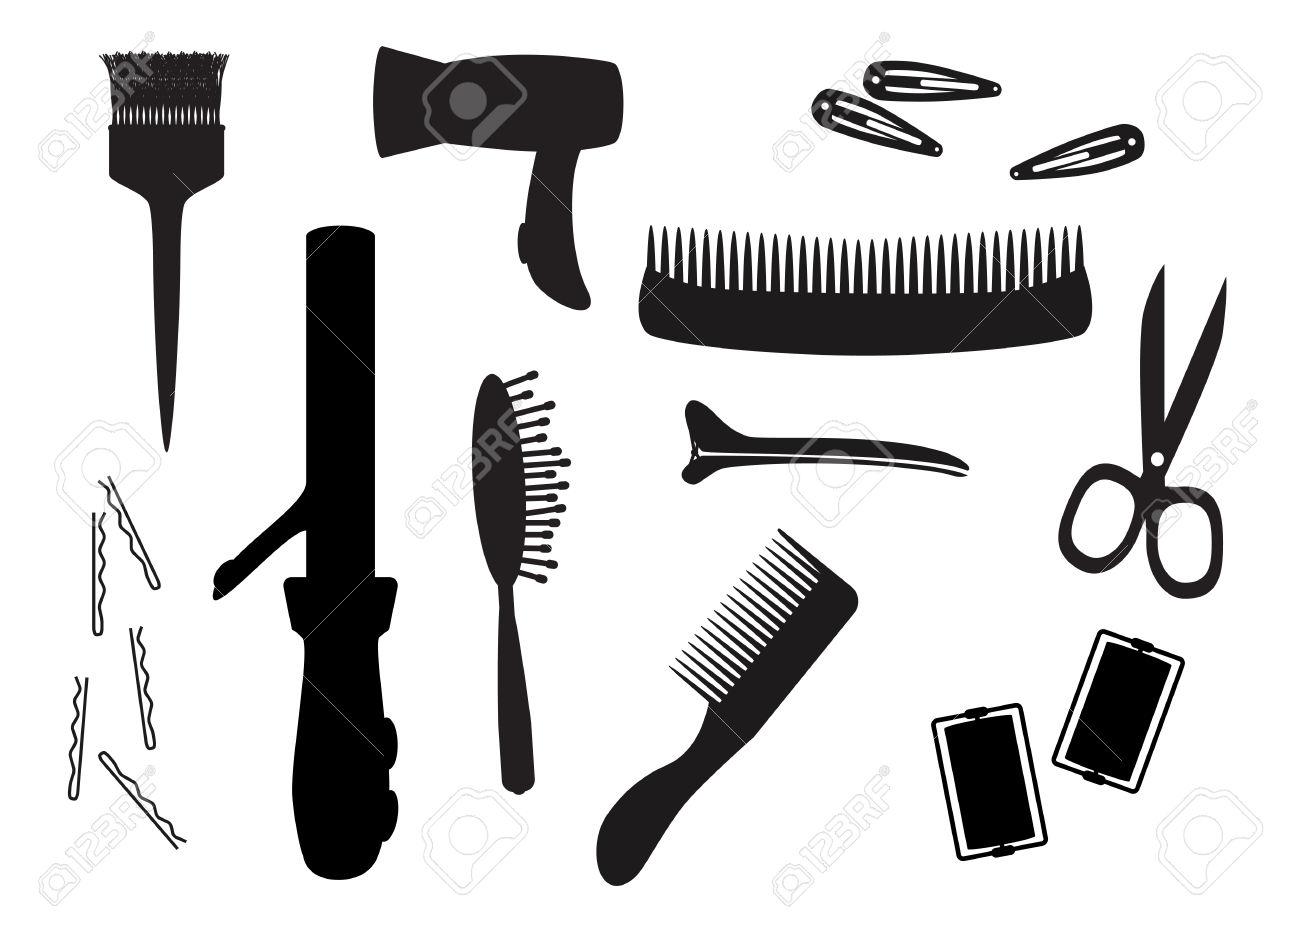 1300x928 Cuisine Black Hair Salon Equipment Silhouettes Royalty Free